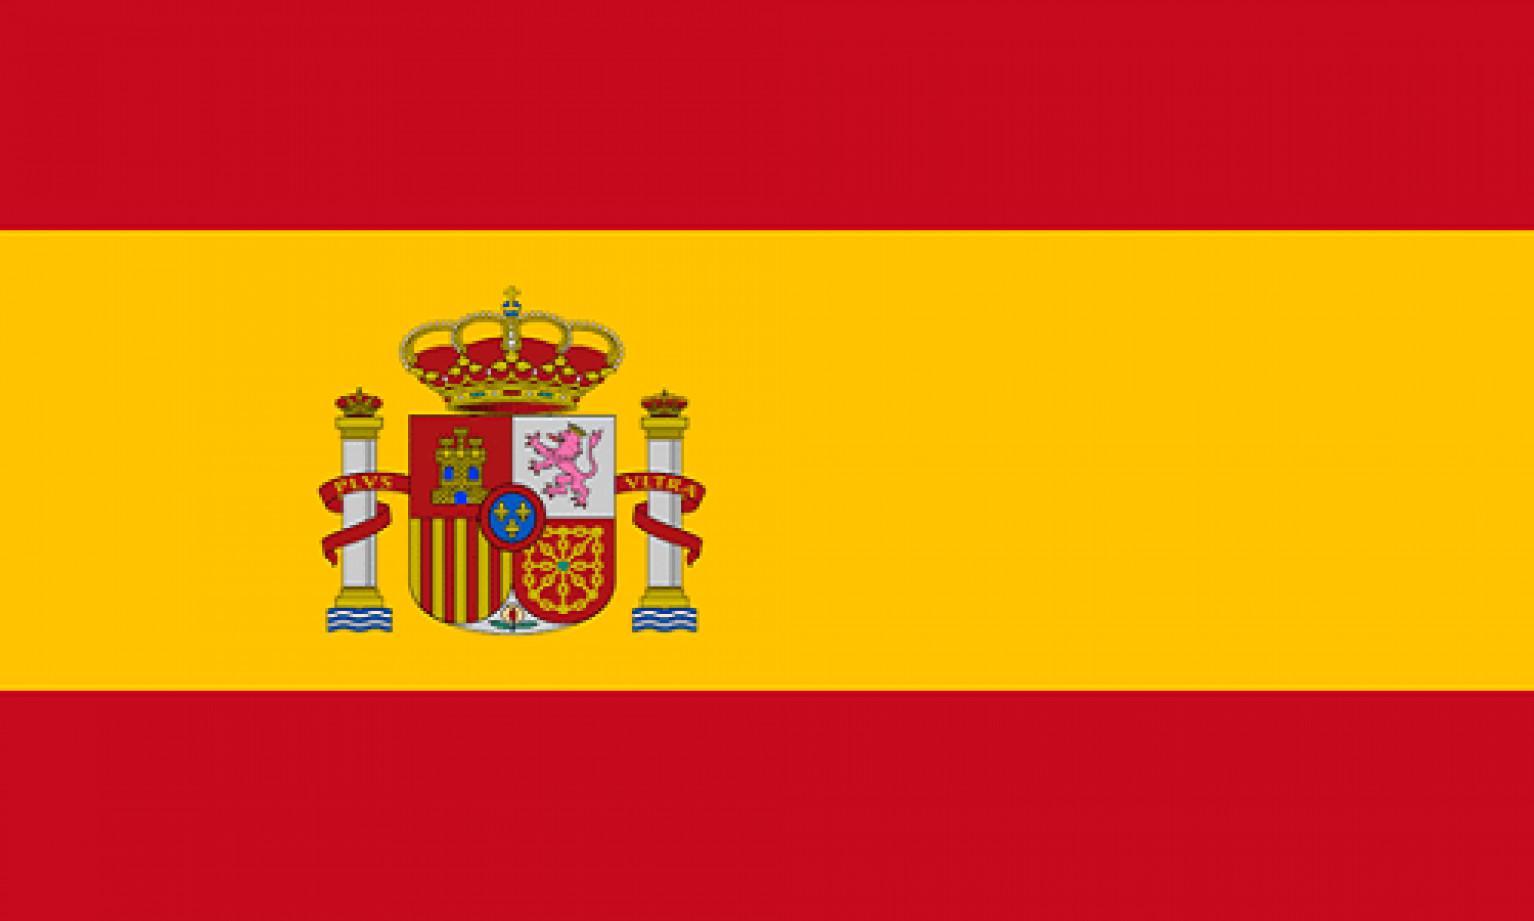 Spanish Peer-to-Peer Lending platforms and market